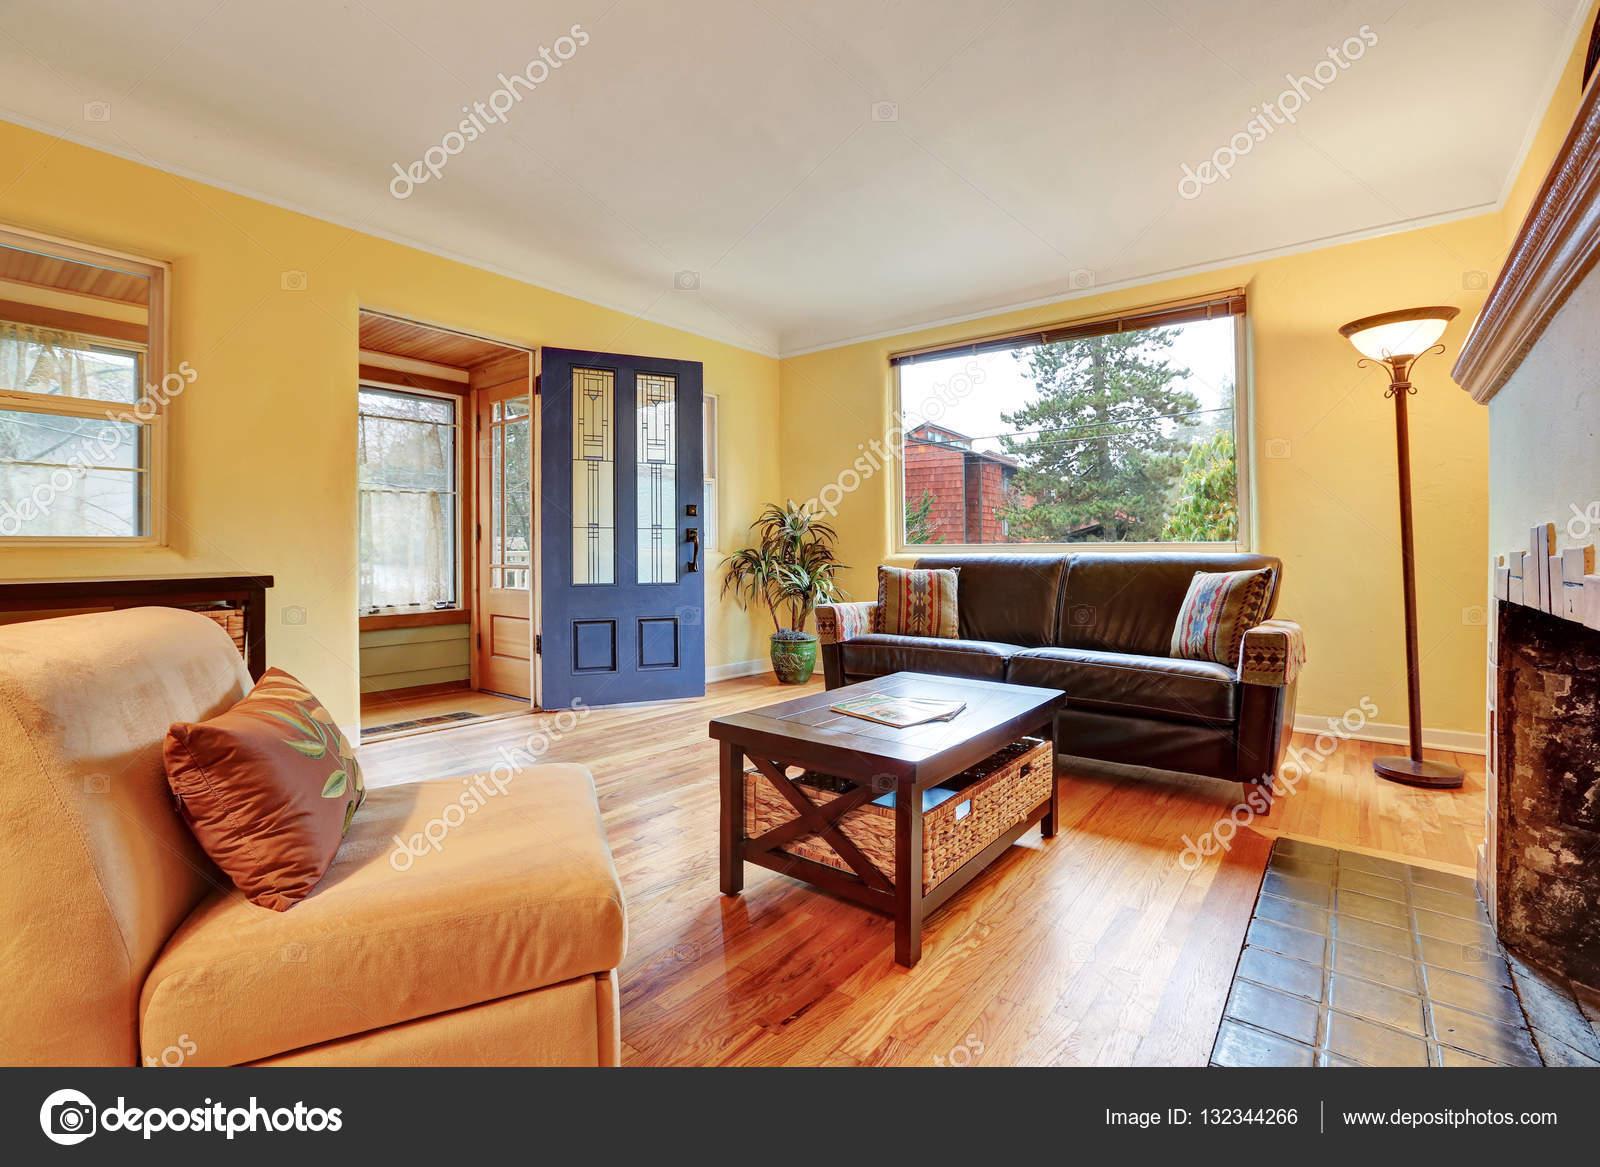 Gezellige woonkamer interieur met warme gele muren for Gezellige woonkamer